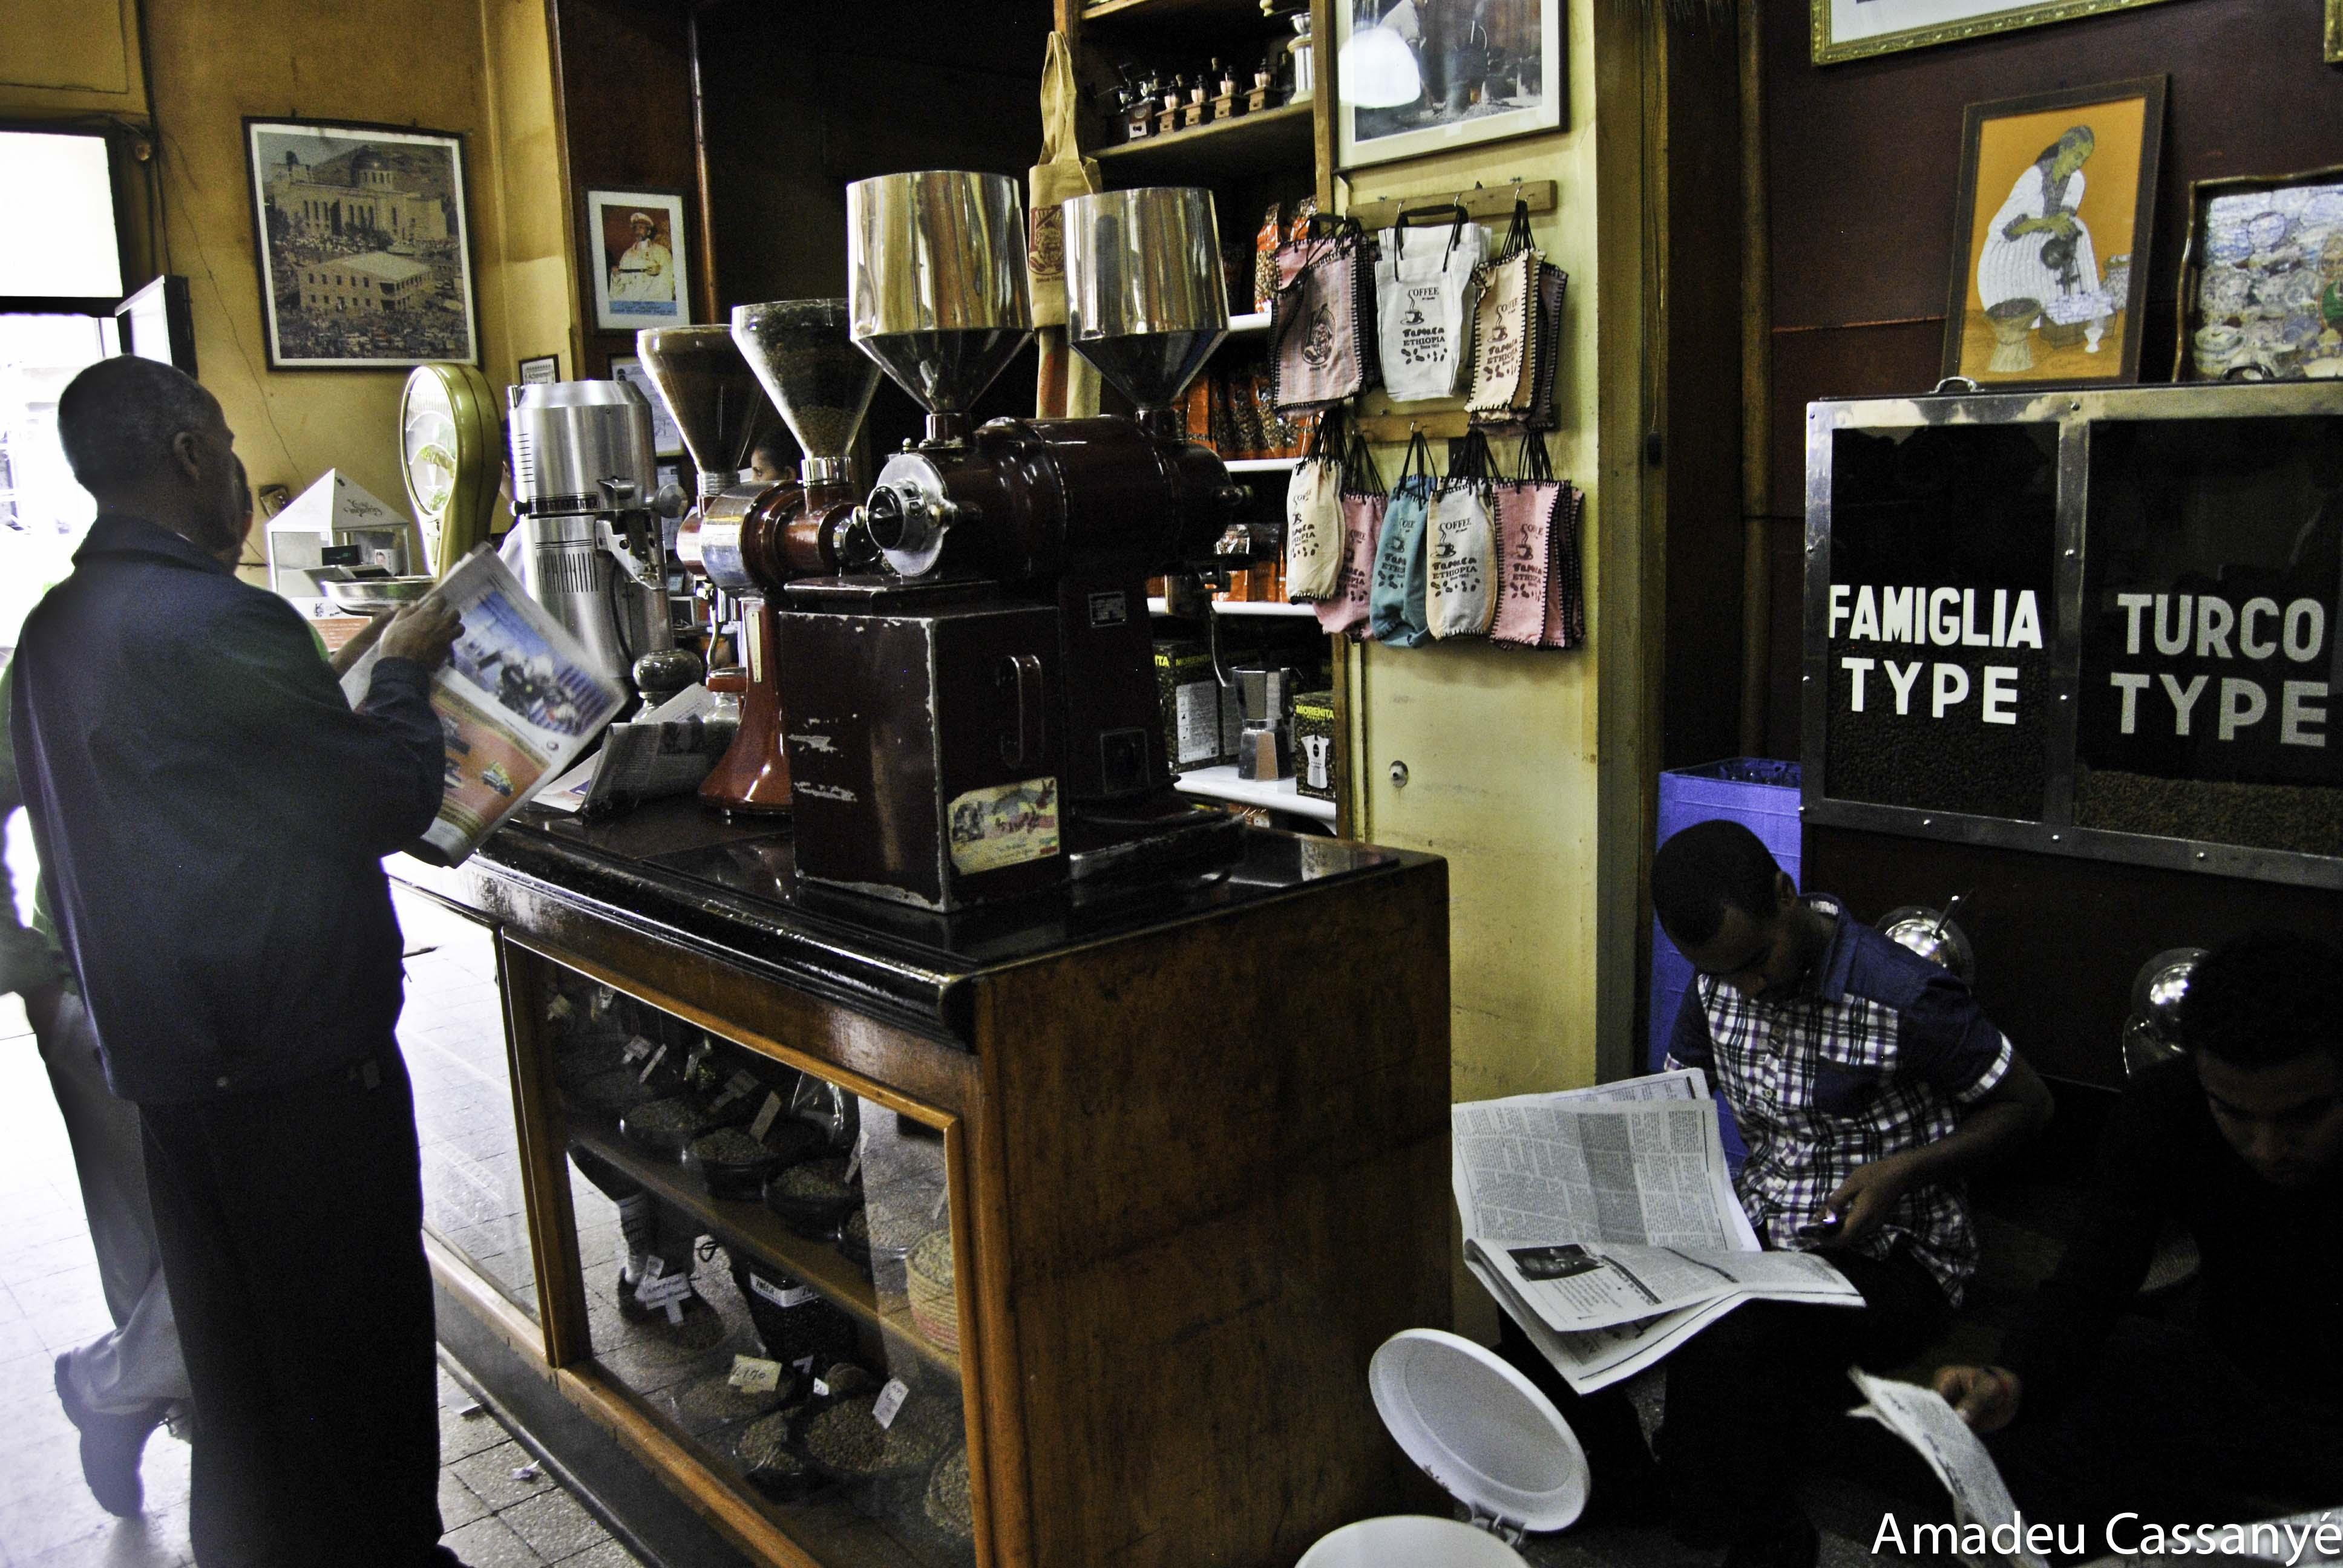 Tomoca Cafe